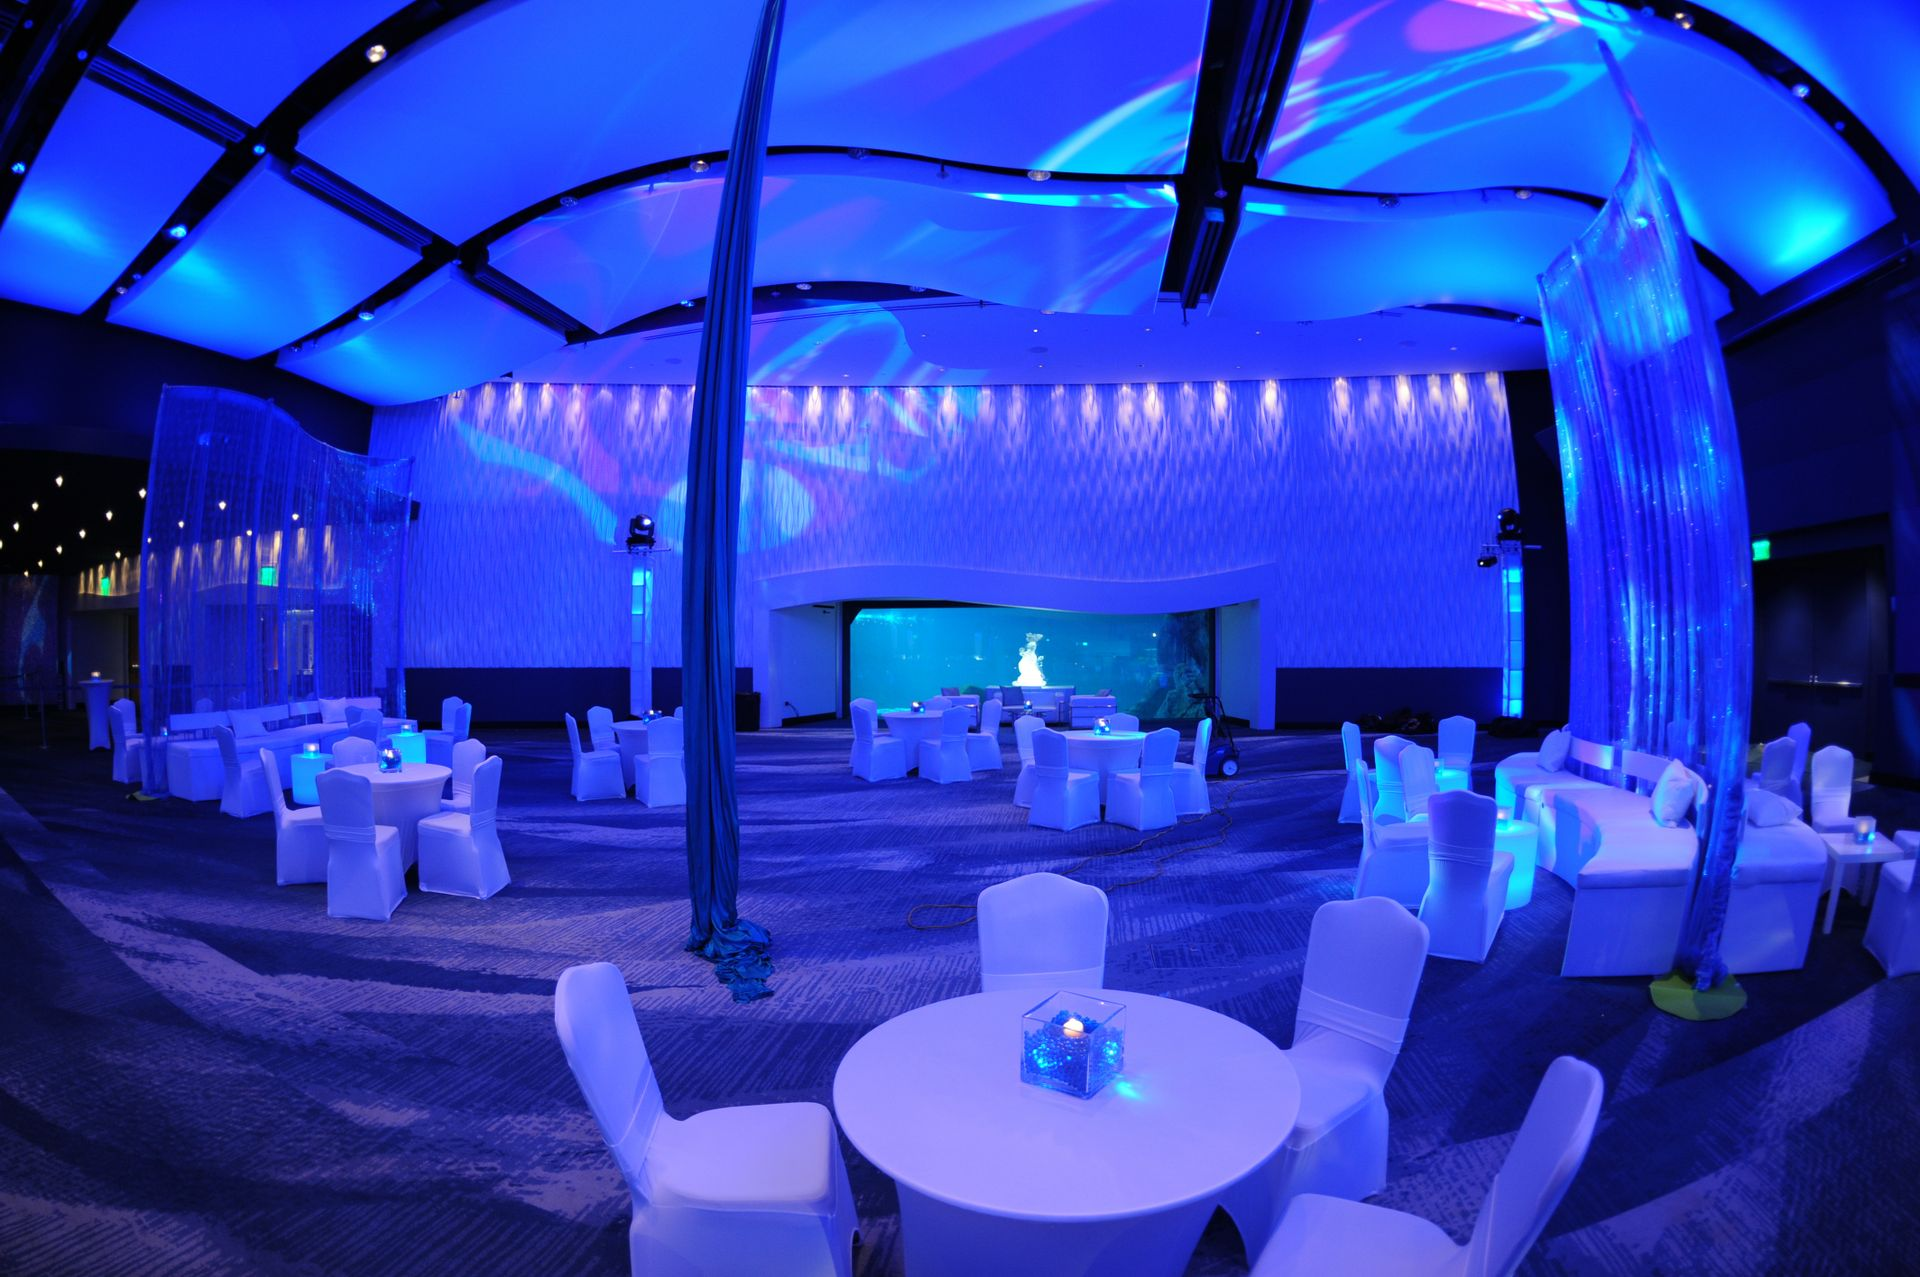 Oceans Ballroom & Arctic Room - Lounge Area